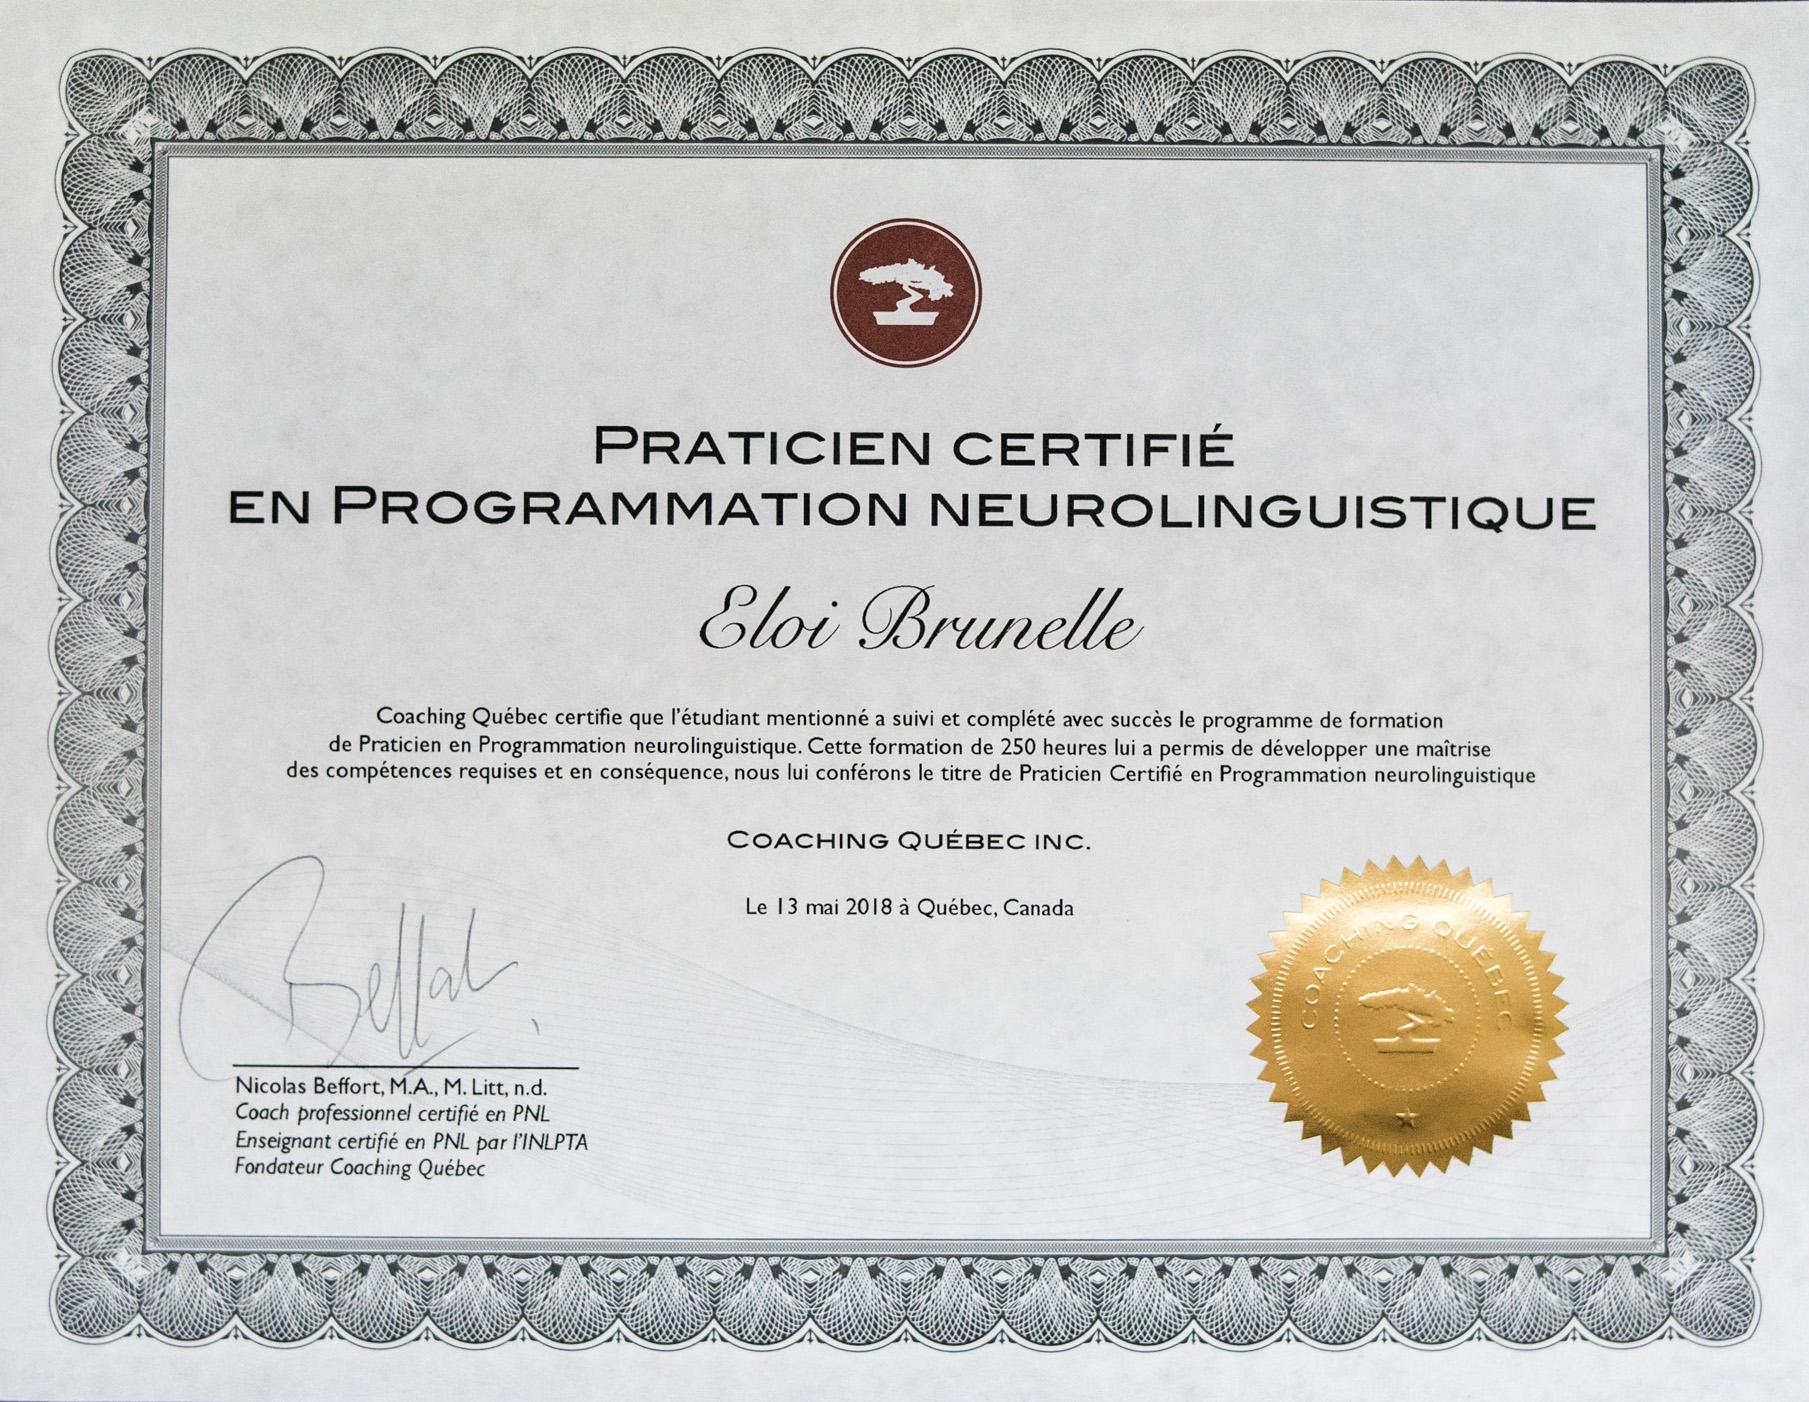 Certification Eloi Praticien PNL cropped.jpg